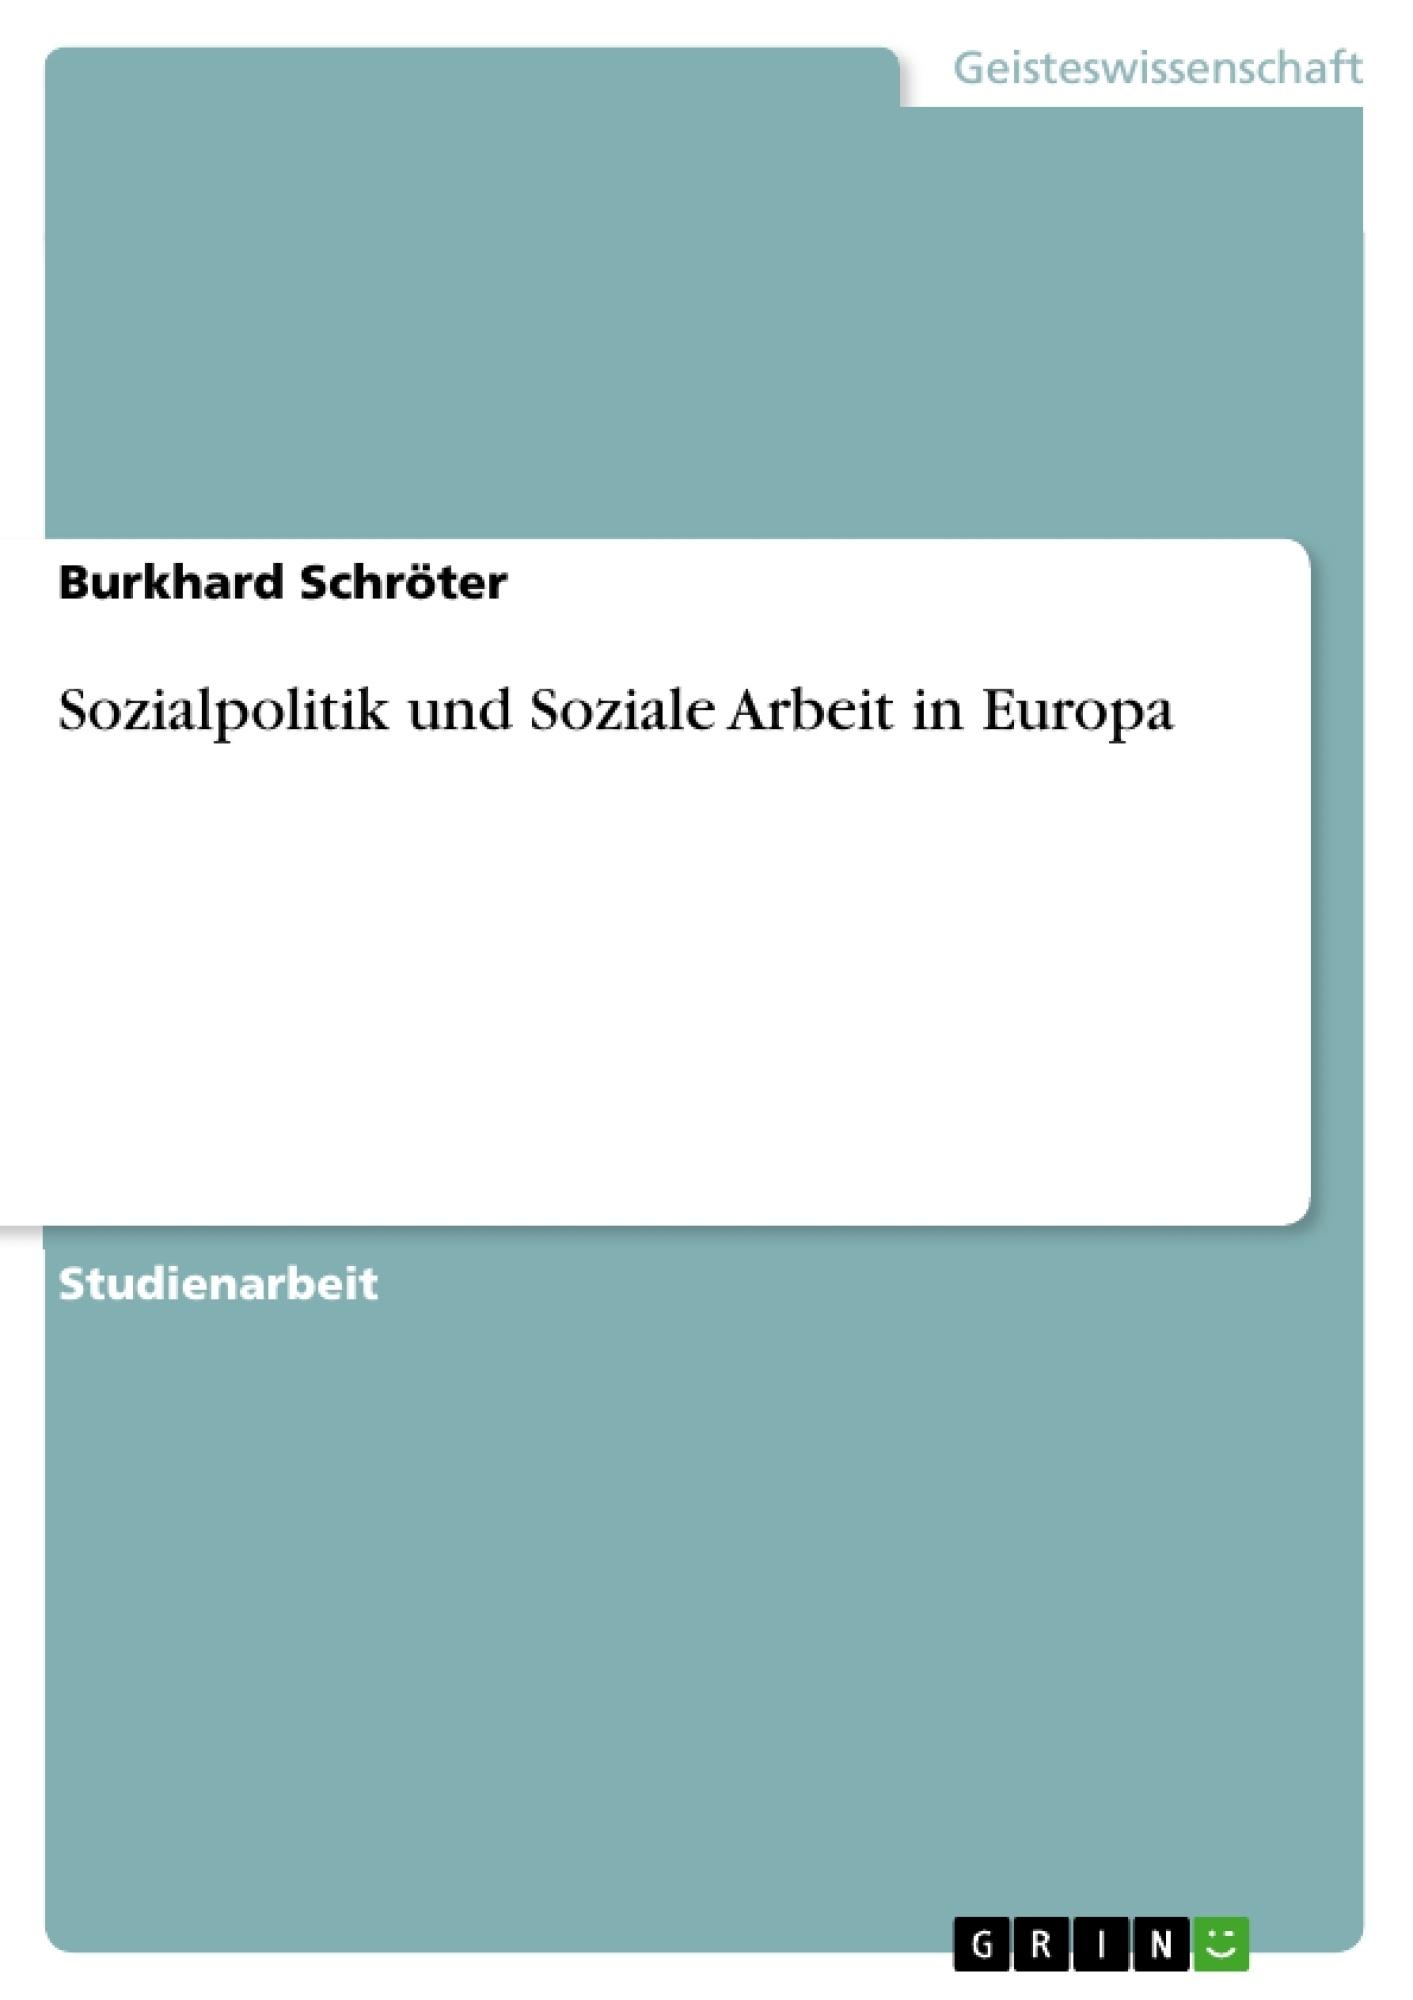 Titel: Sozialpolitik und Soziale Arbeit in Europa